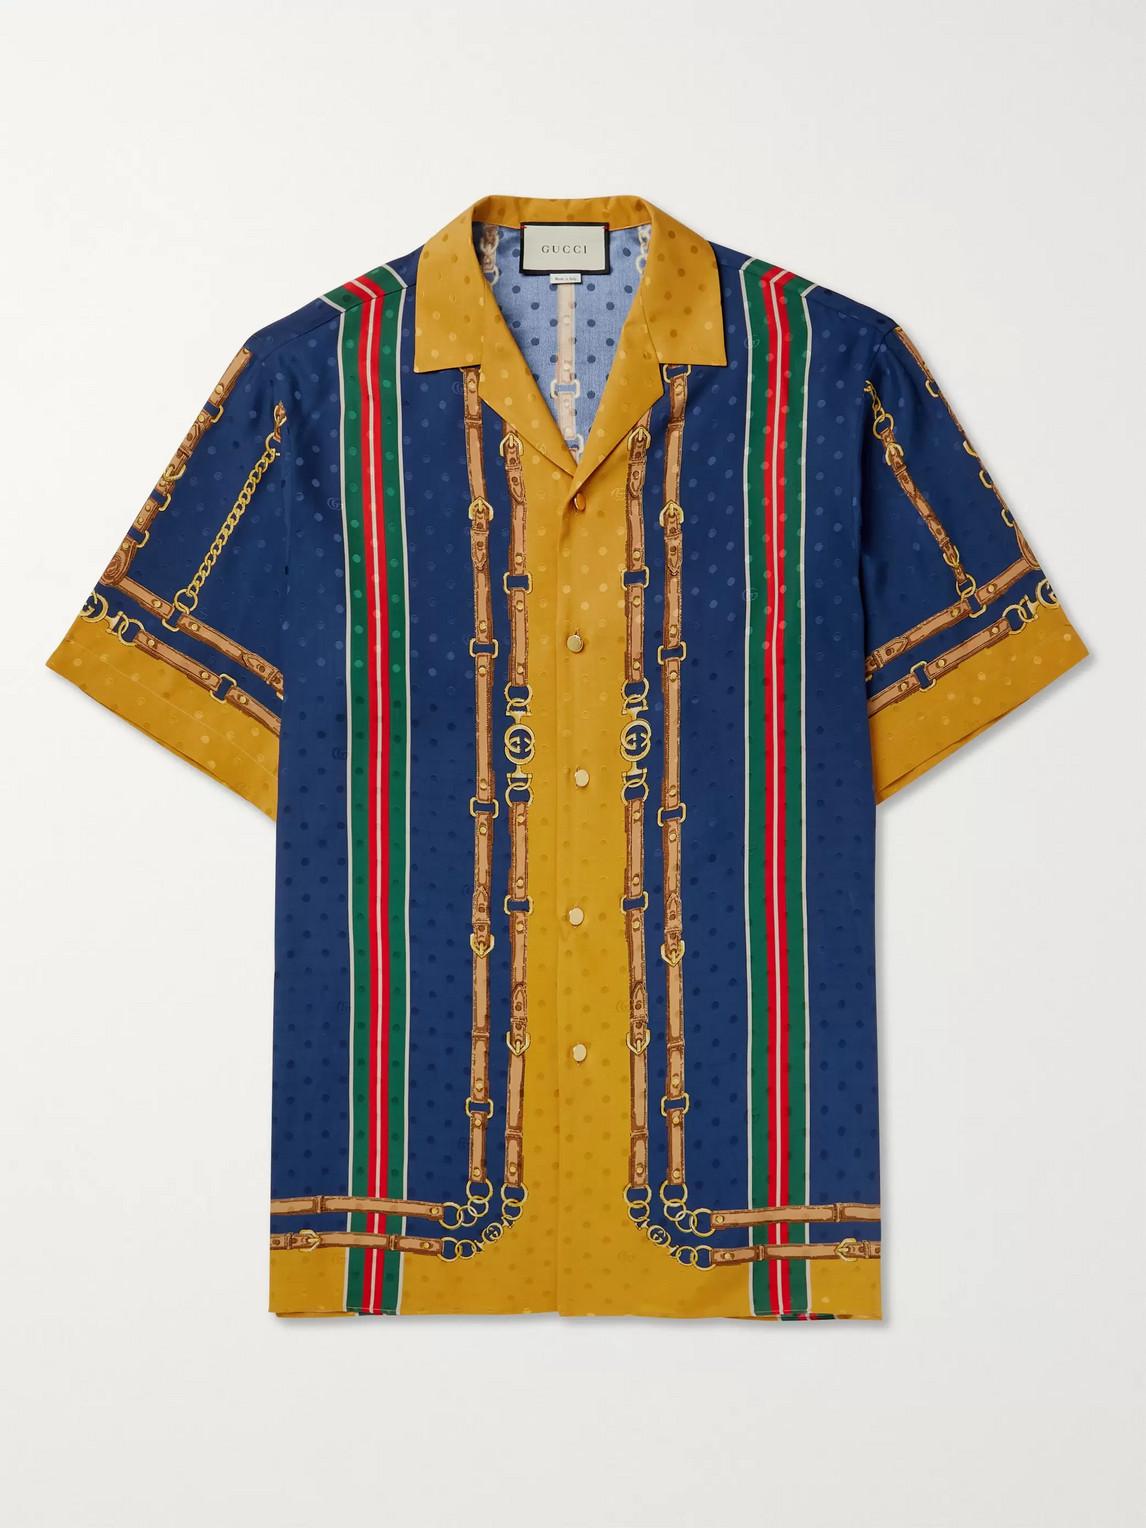 Gucci Camp-collar Printed Silk-jacquard Shirt In Multi